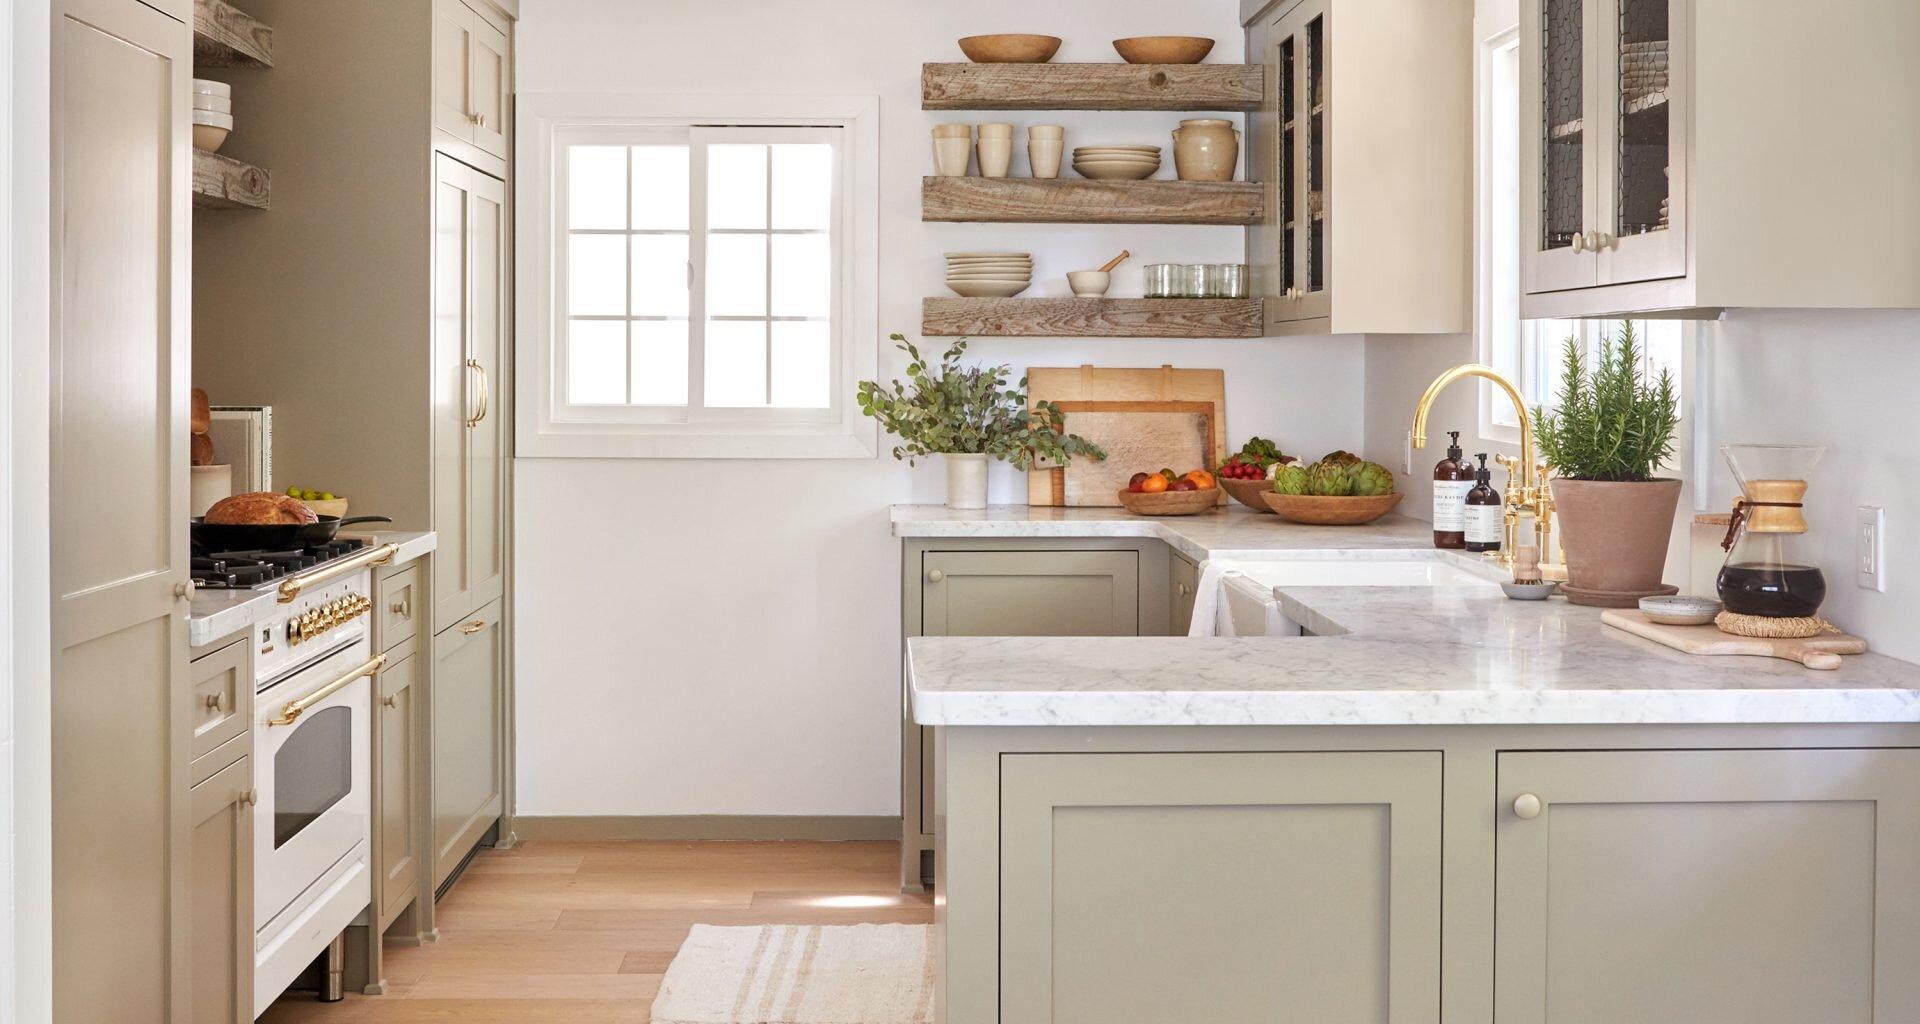 Jenni Kayne Lake House - Kitchen, Stove & Pantry